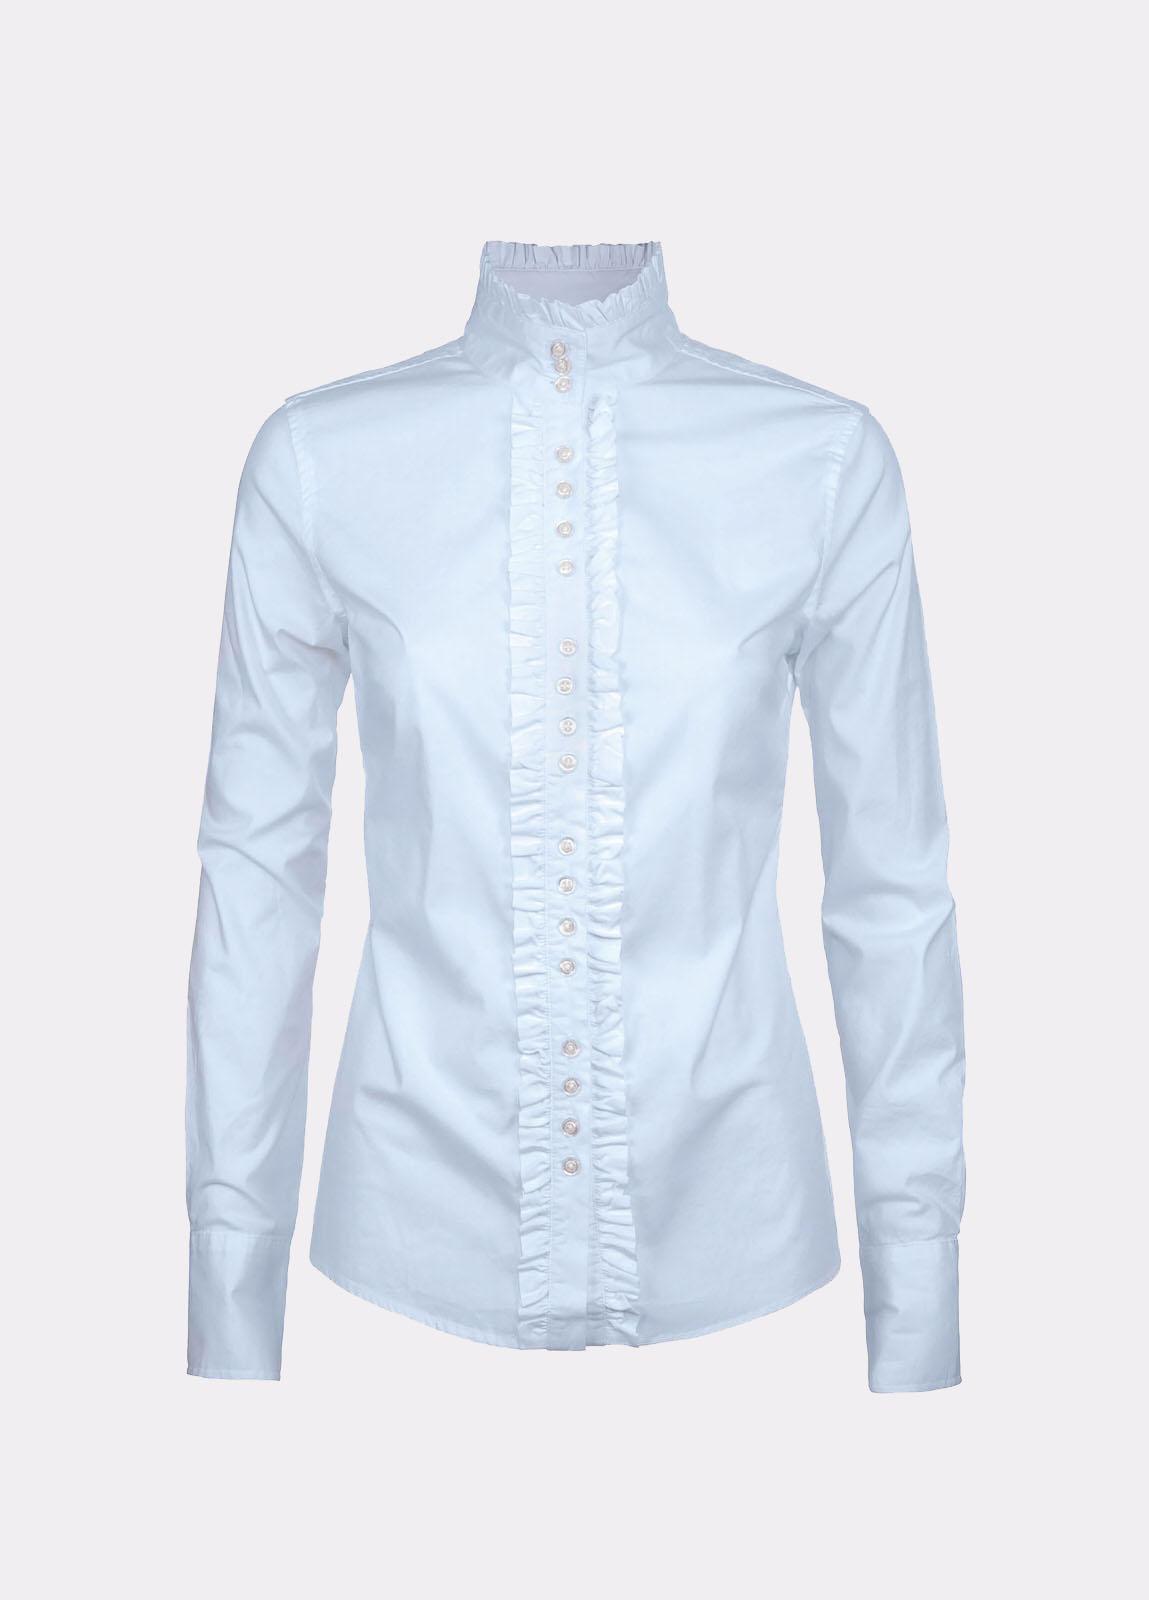 Chamomile Shirt - Pale Blue